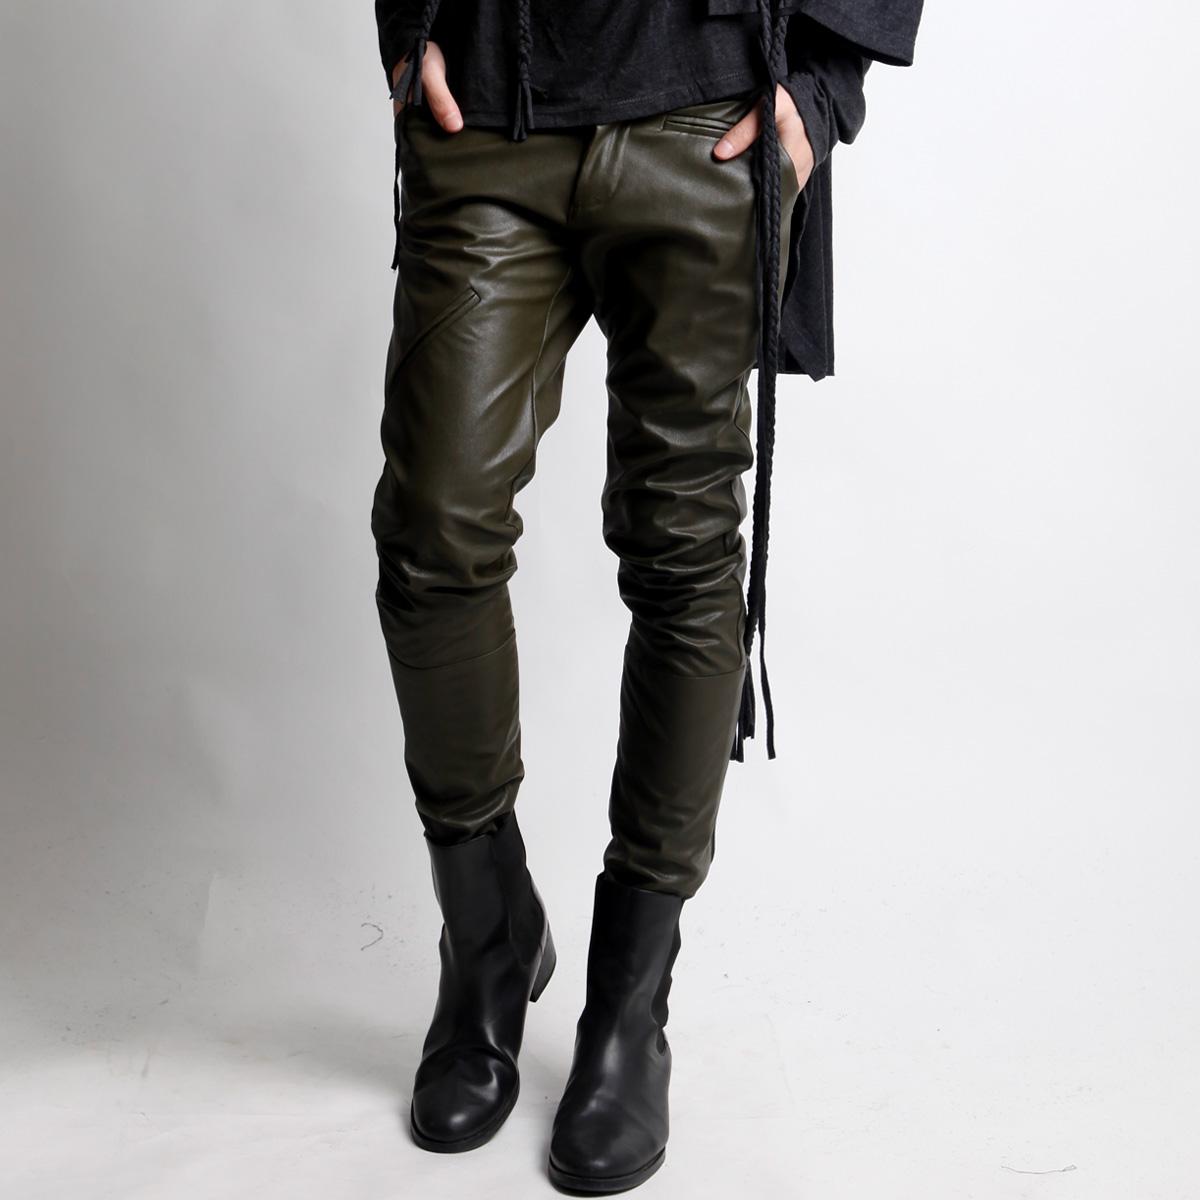 binbaron原創設計男裝pu男褲 時尚緊身韓版男士皮褲 休閑皮褲 男圖片